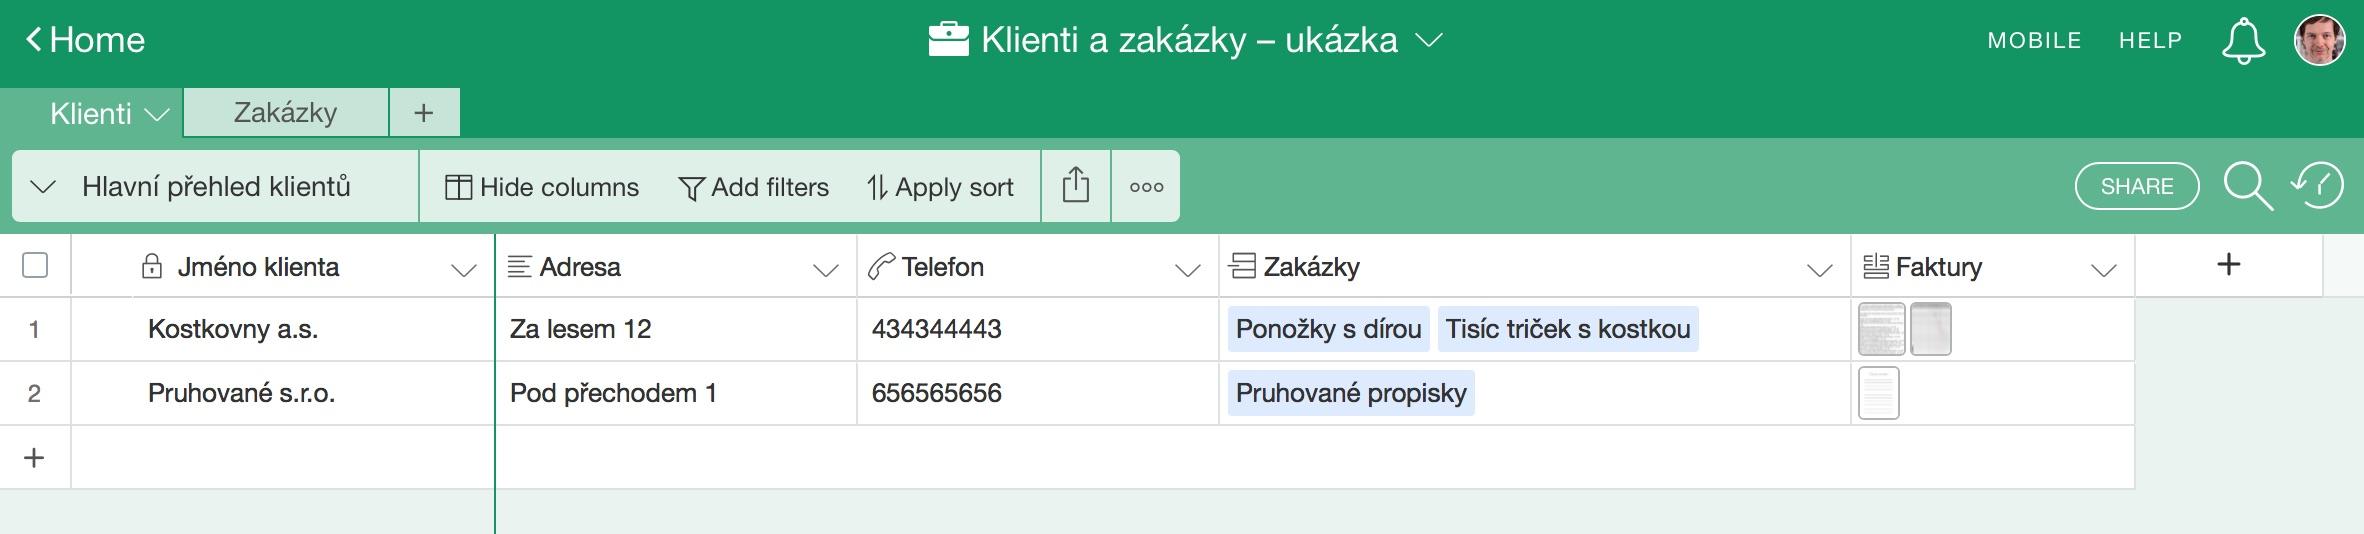 Klienti_a_zaka-zky_-uka-zka-_Airtable.891dec1c0db346b2993d7dd73caec658